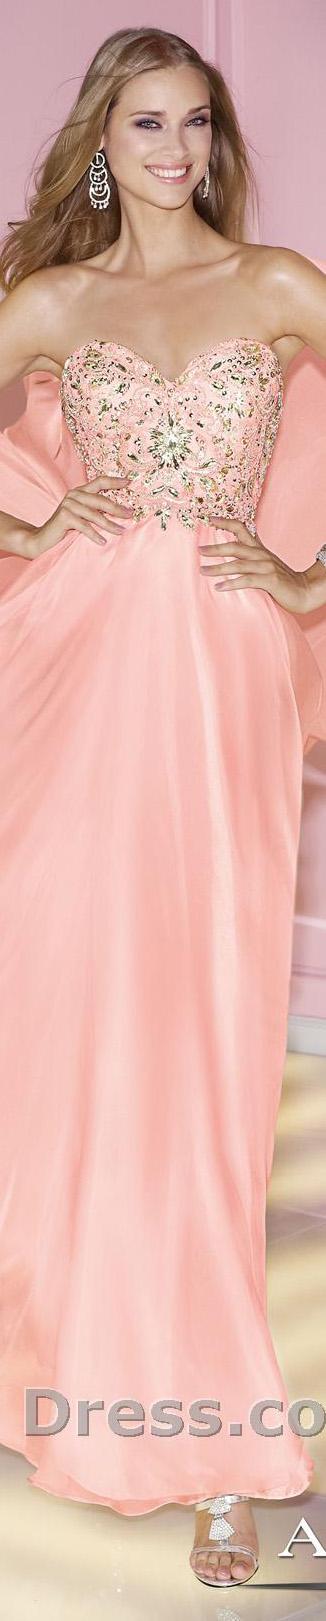 Alyce Paris design- ♔LadyLuxury♔   BILLIONAIRE\'S CLOSET ...